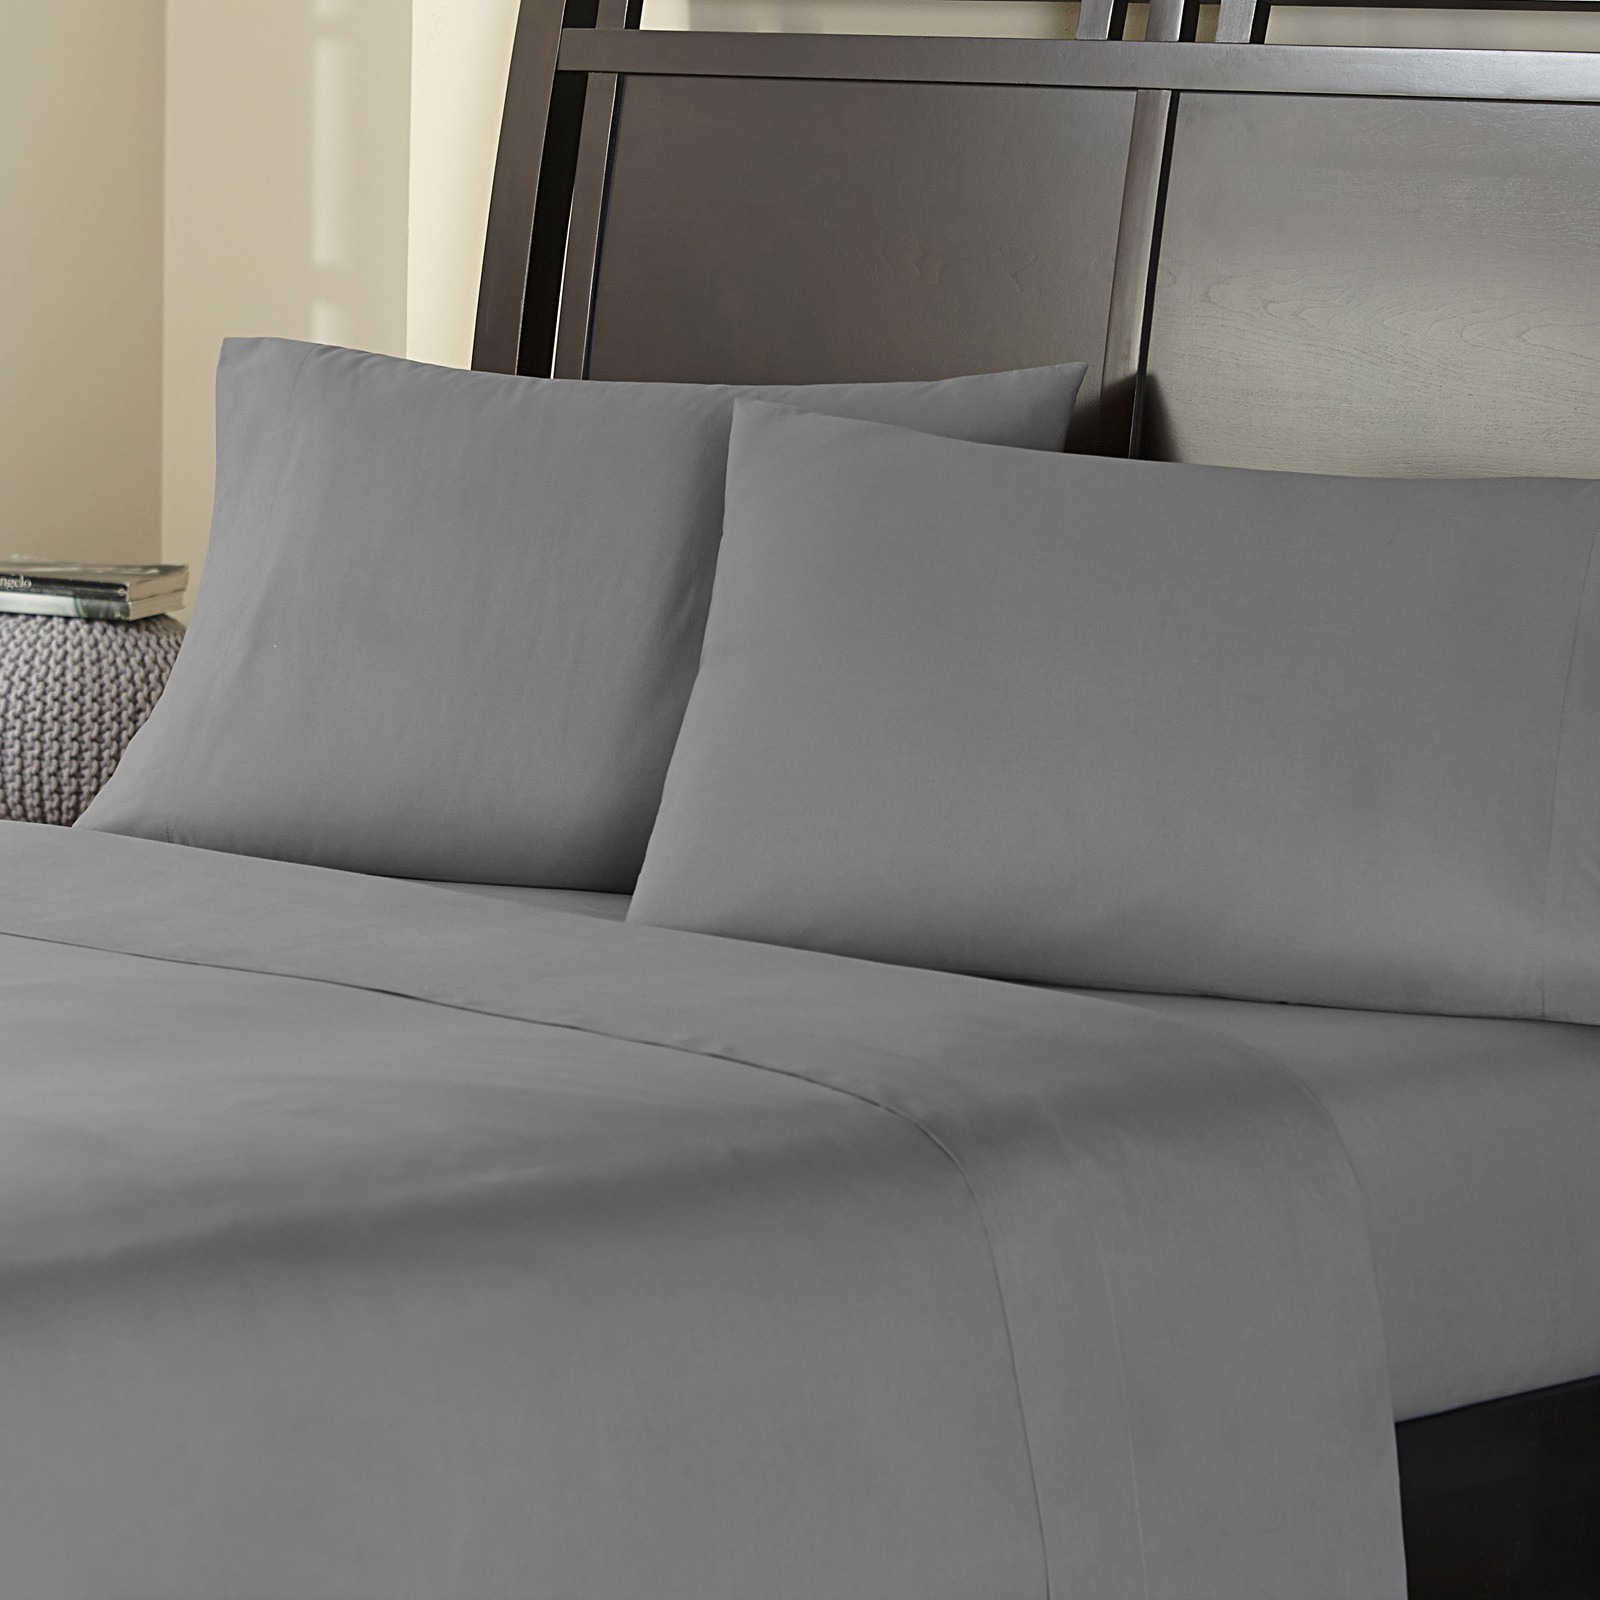 Amaze by welspun cotton sheet set bedding king navy blue - Amaze By Welspun Cotton Sheet Set Bedding King Navy Blue 2